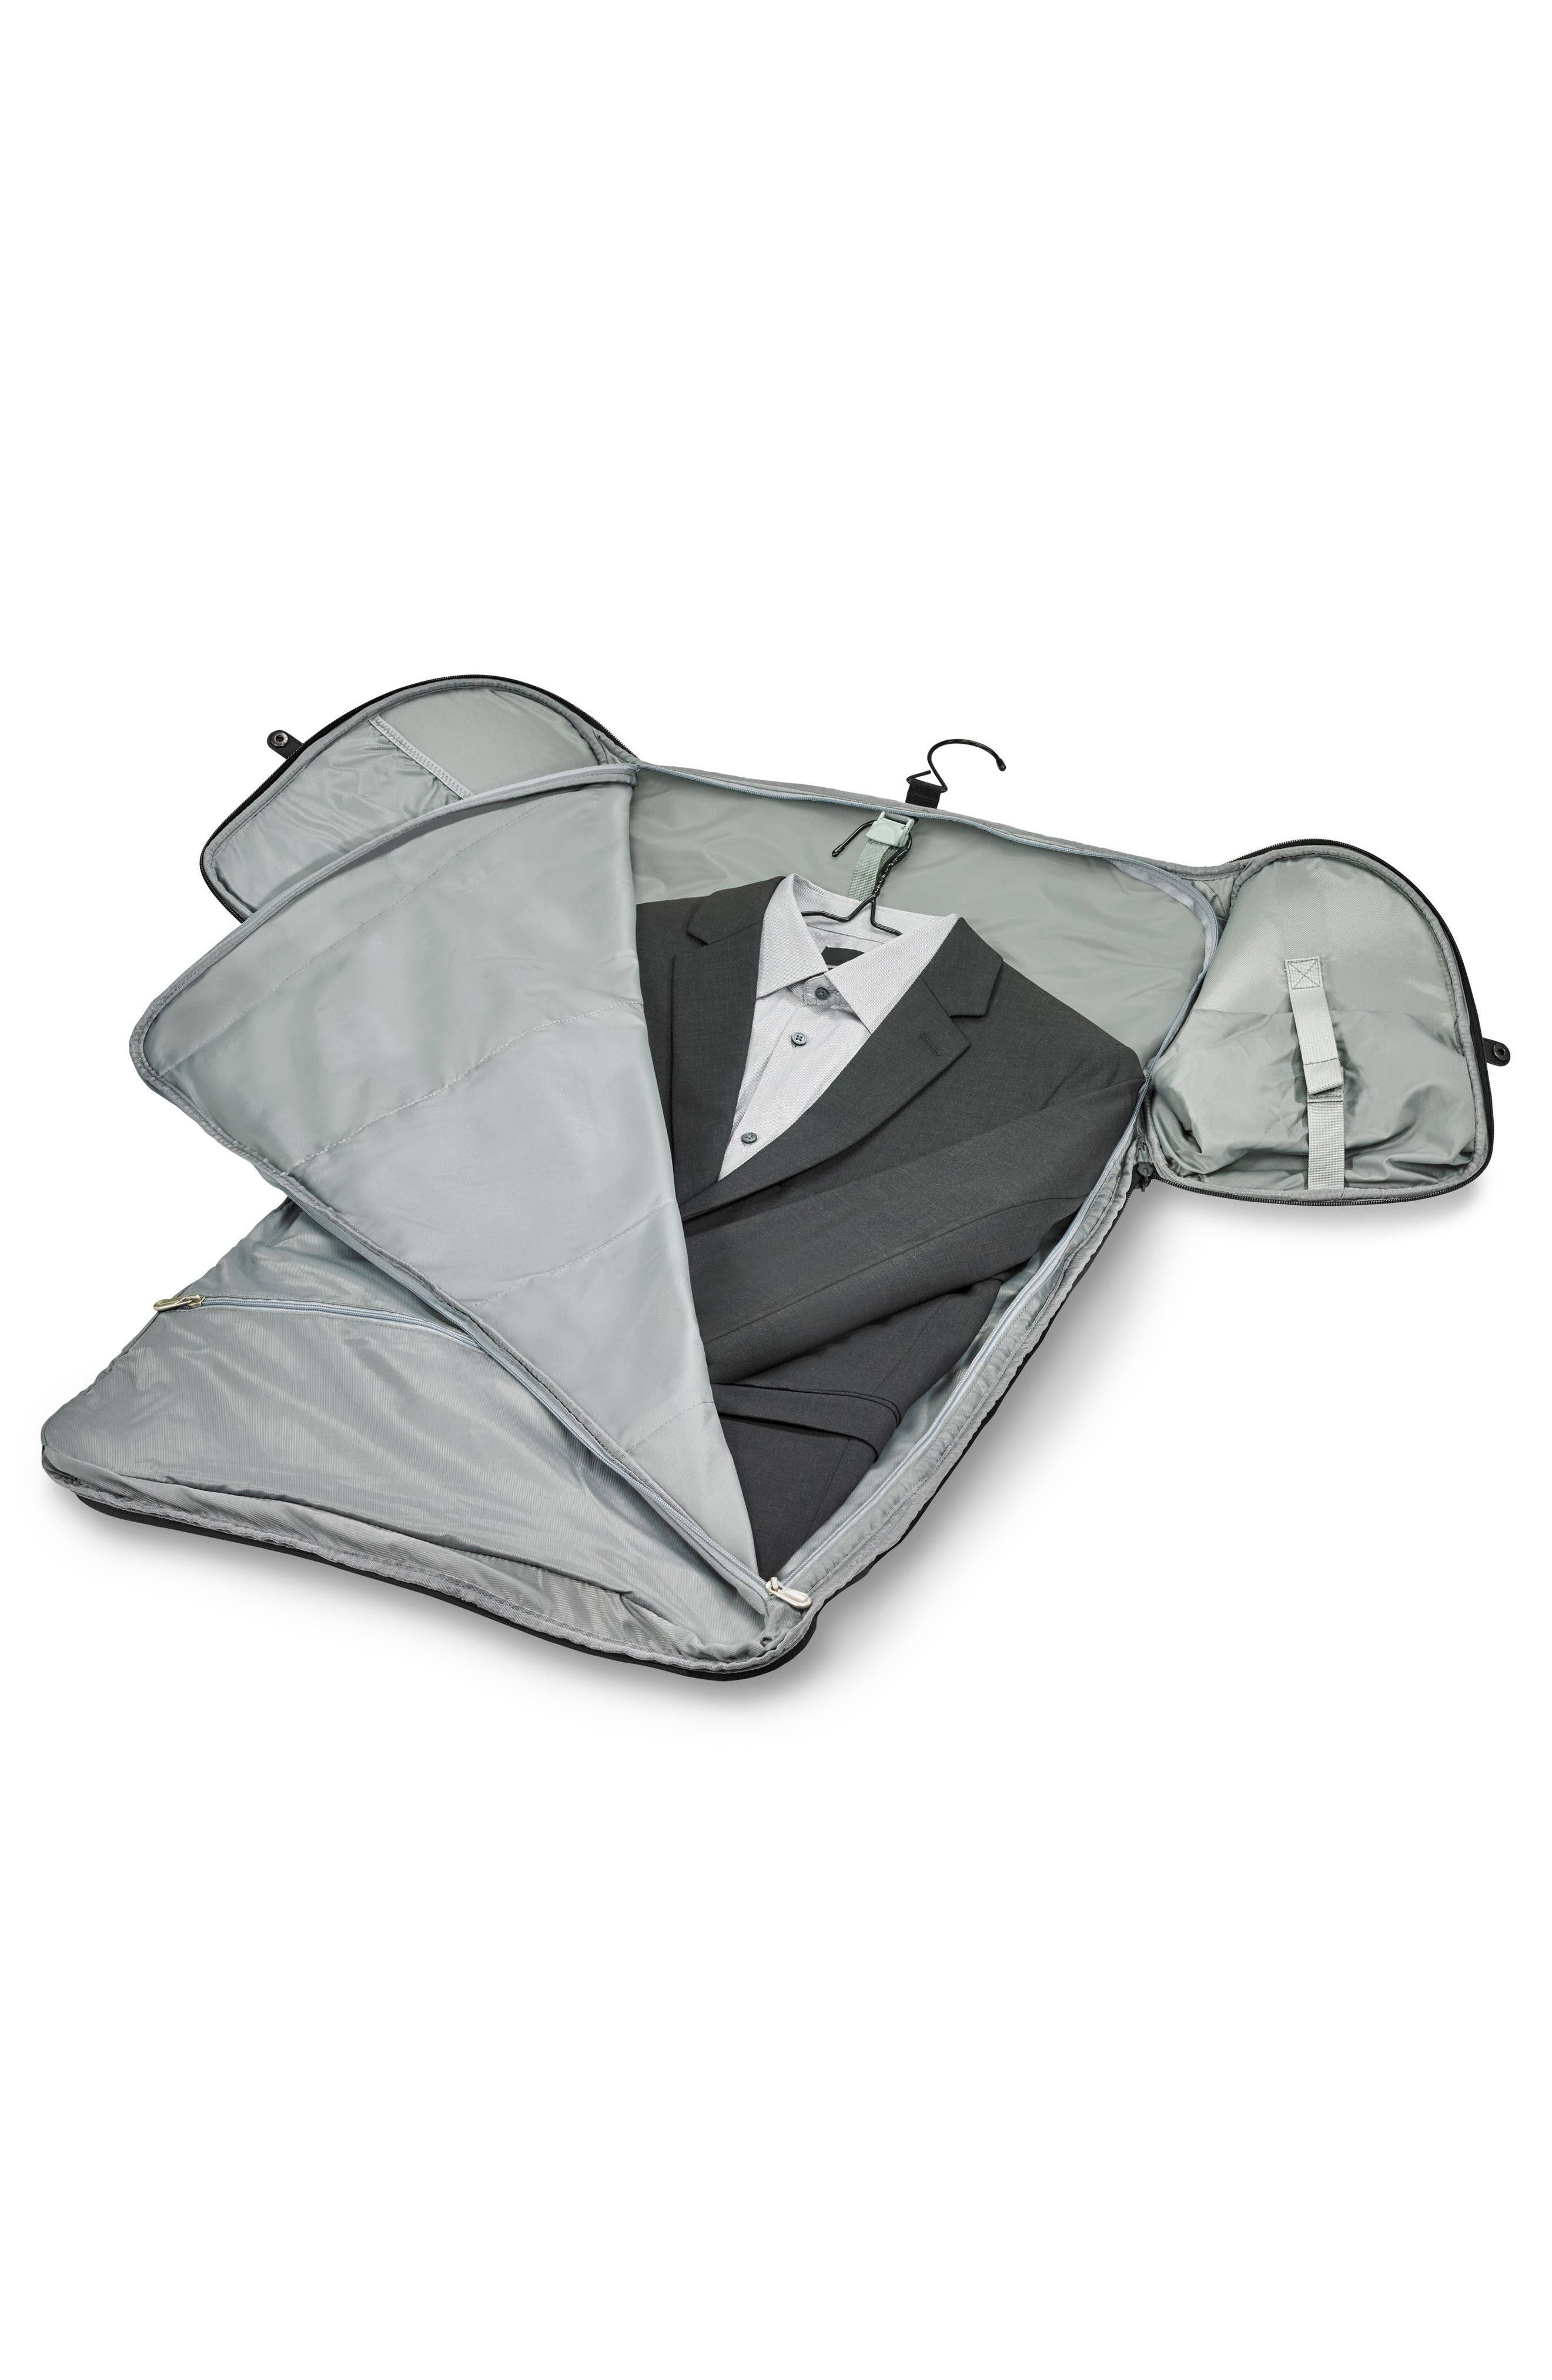 BRIGGS & RILEY,                             Baseline Suiter Duffel Bag,                             Alternate thumbnail 2, color,                             BLACK